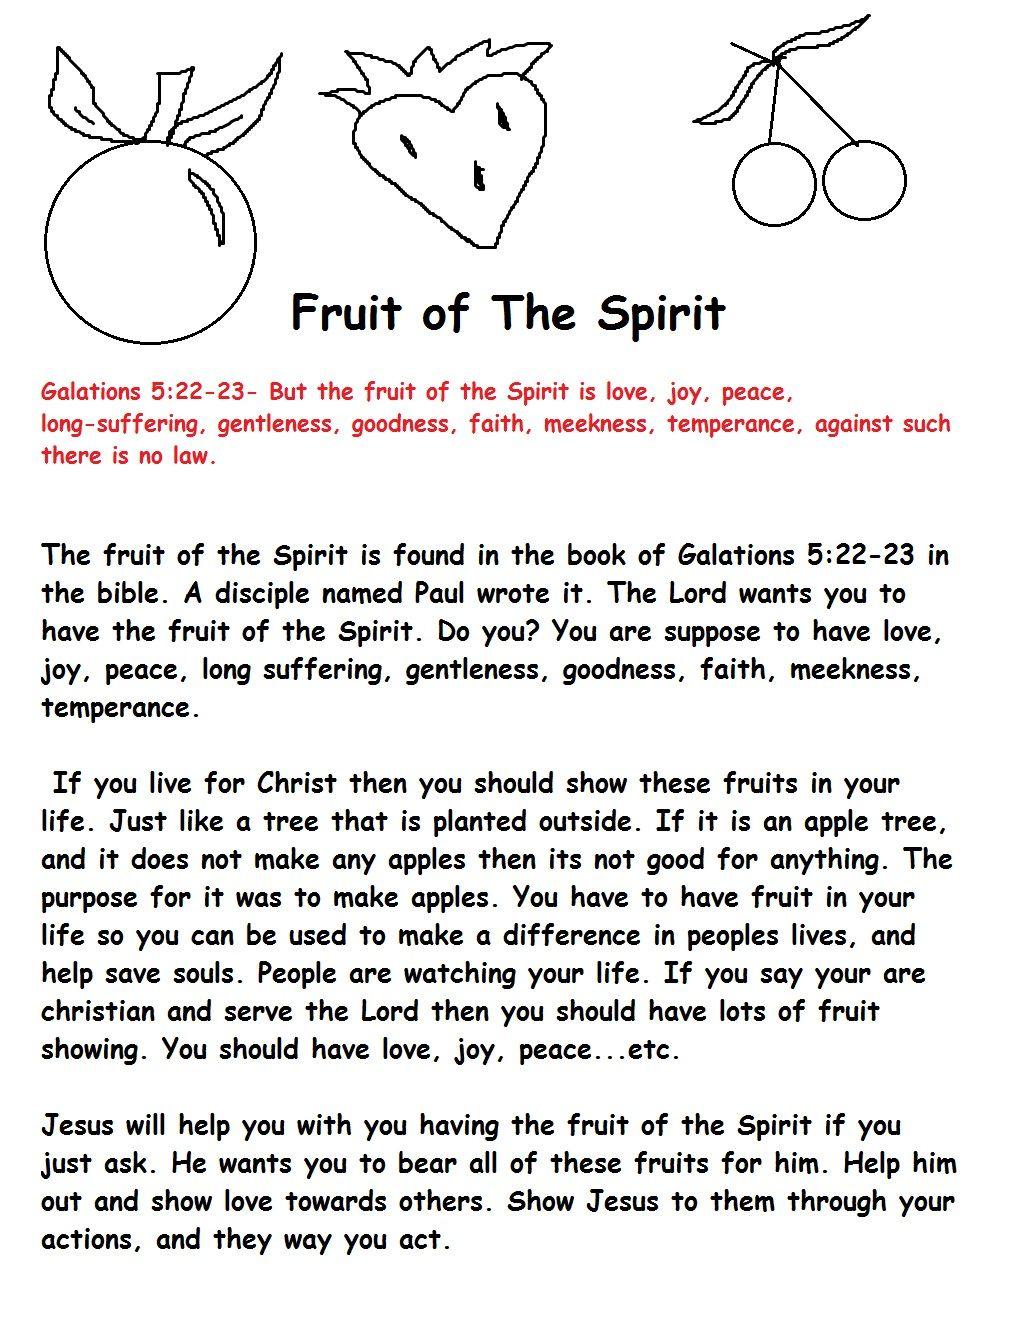 Fruit Of The Spirit For Kids | Fruit Of The Spirit Sunday School - Free Printable Sunday School Lessons For Kids